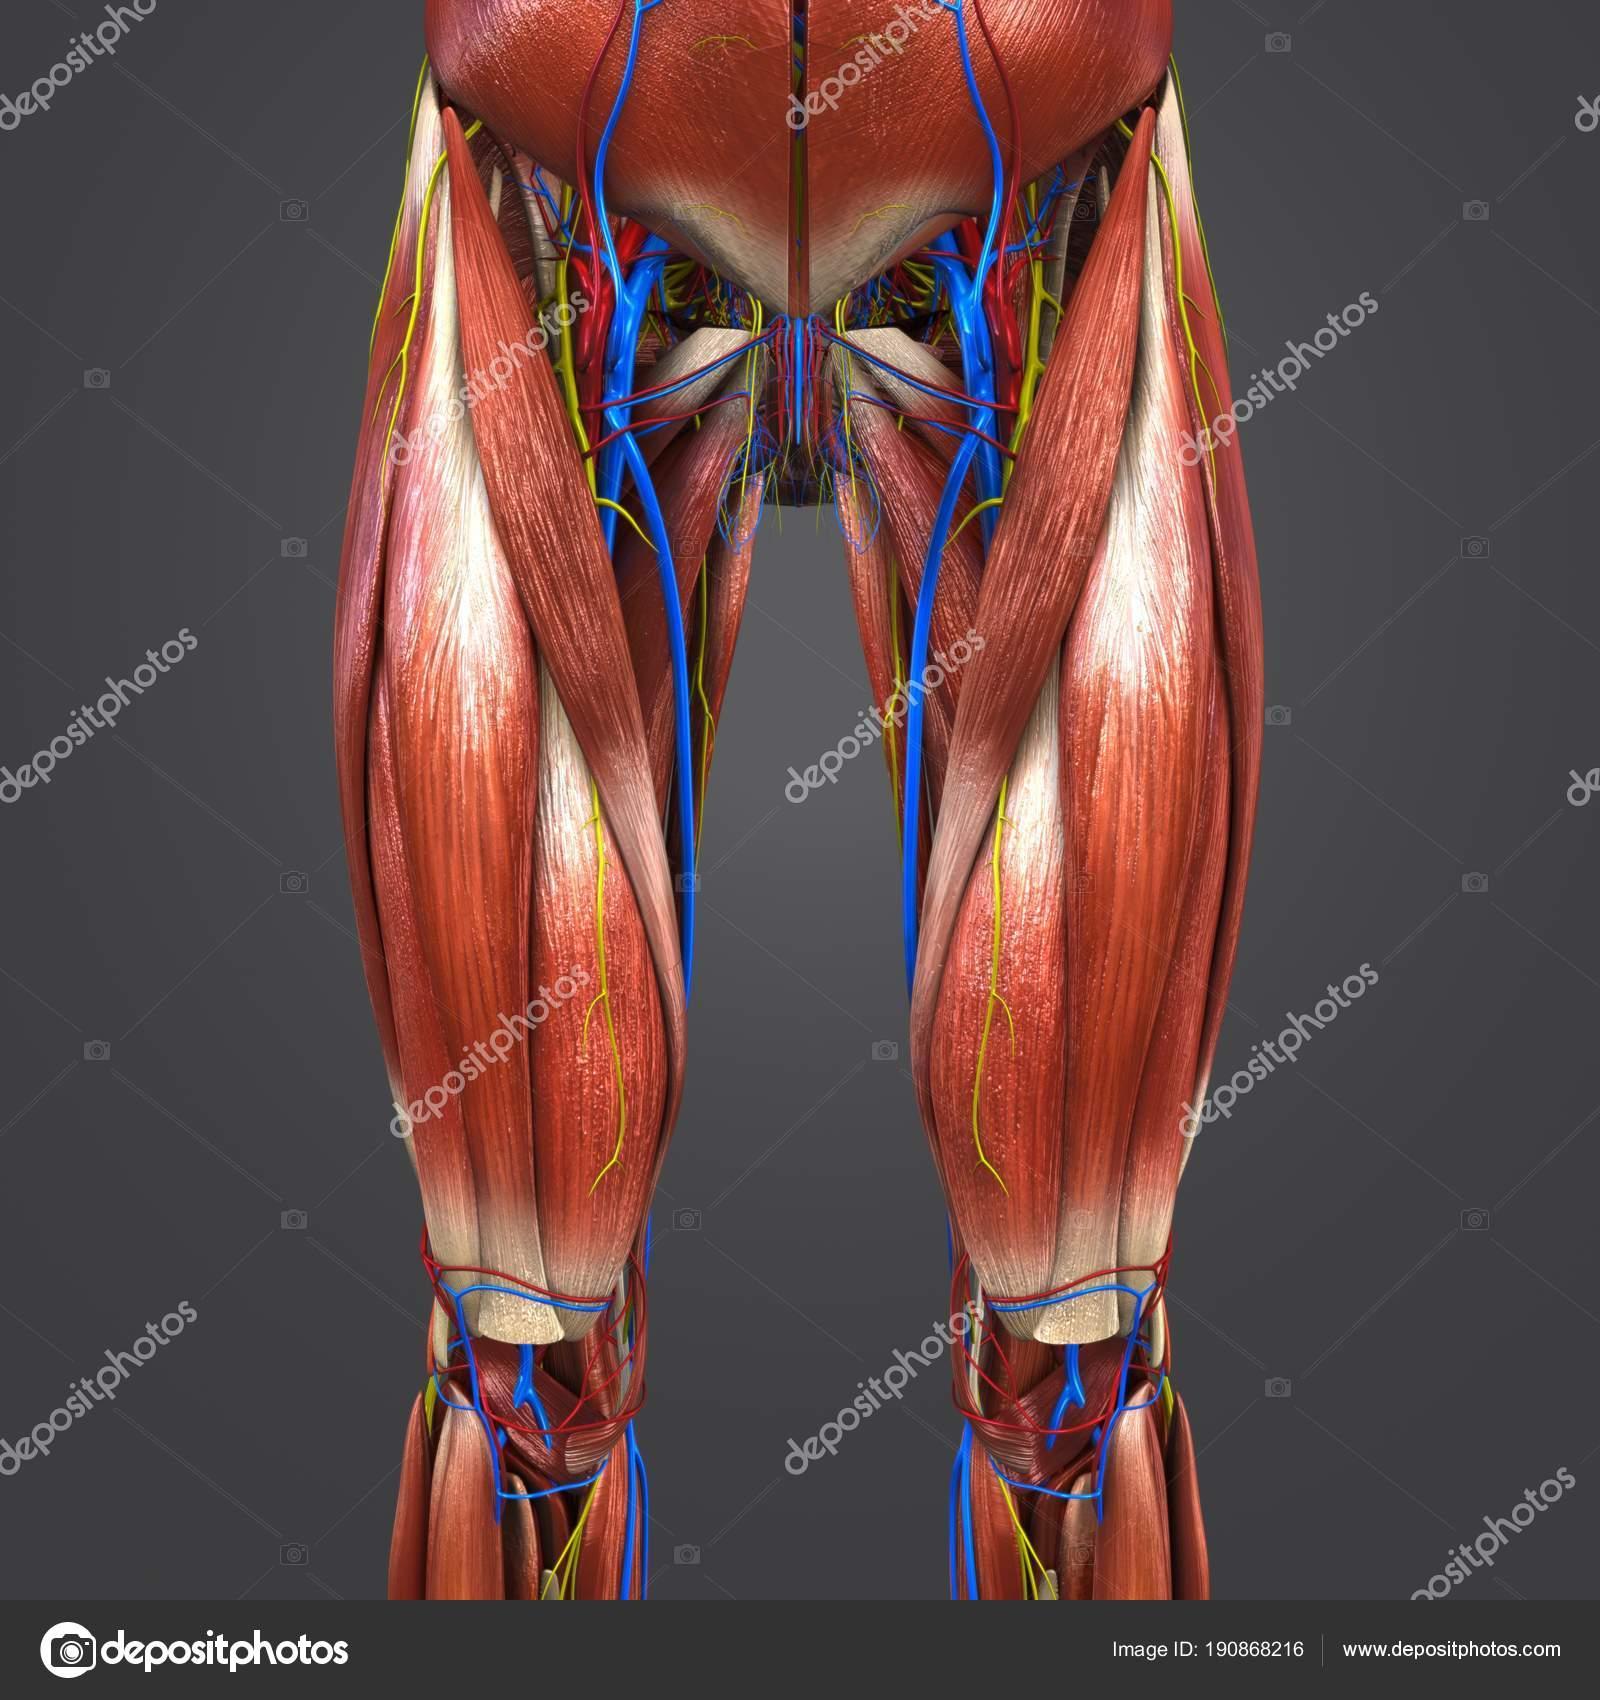 Colorful Medical Illustration Human Hips Thighs Muscles Circulatory